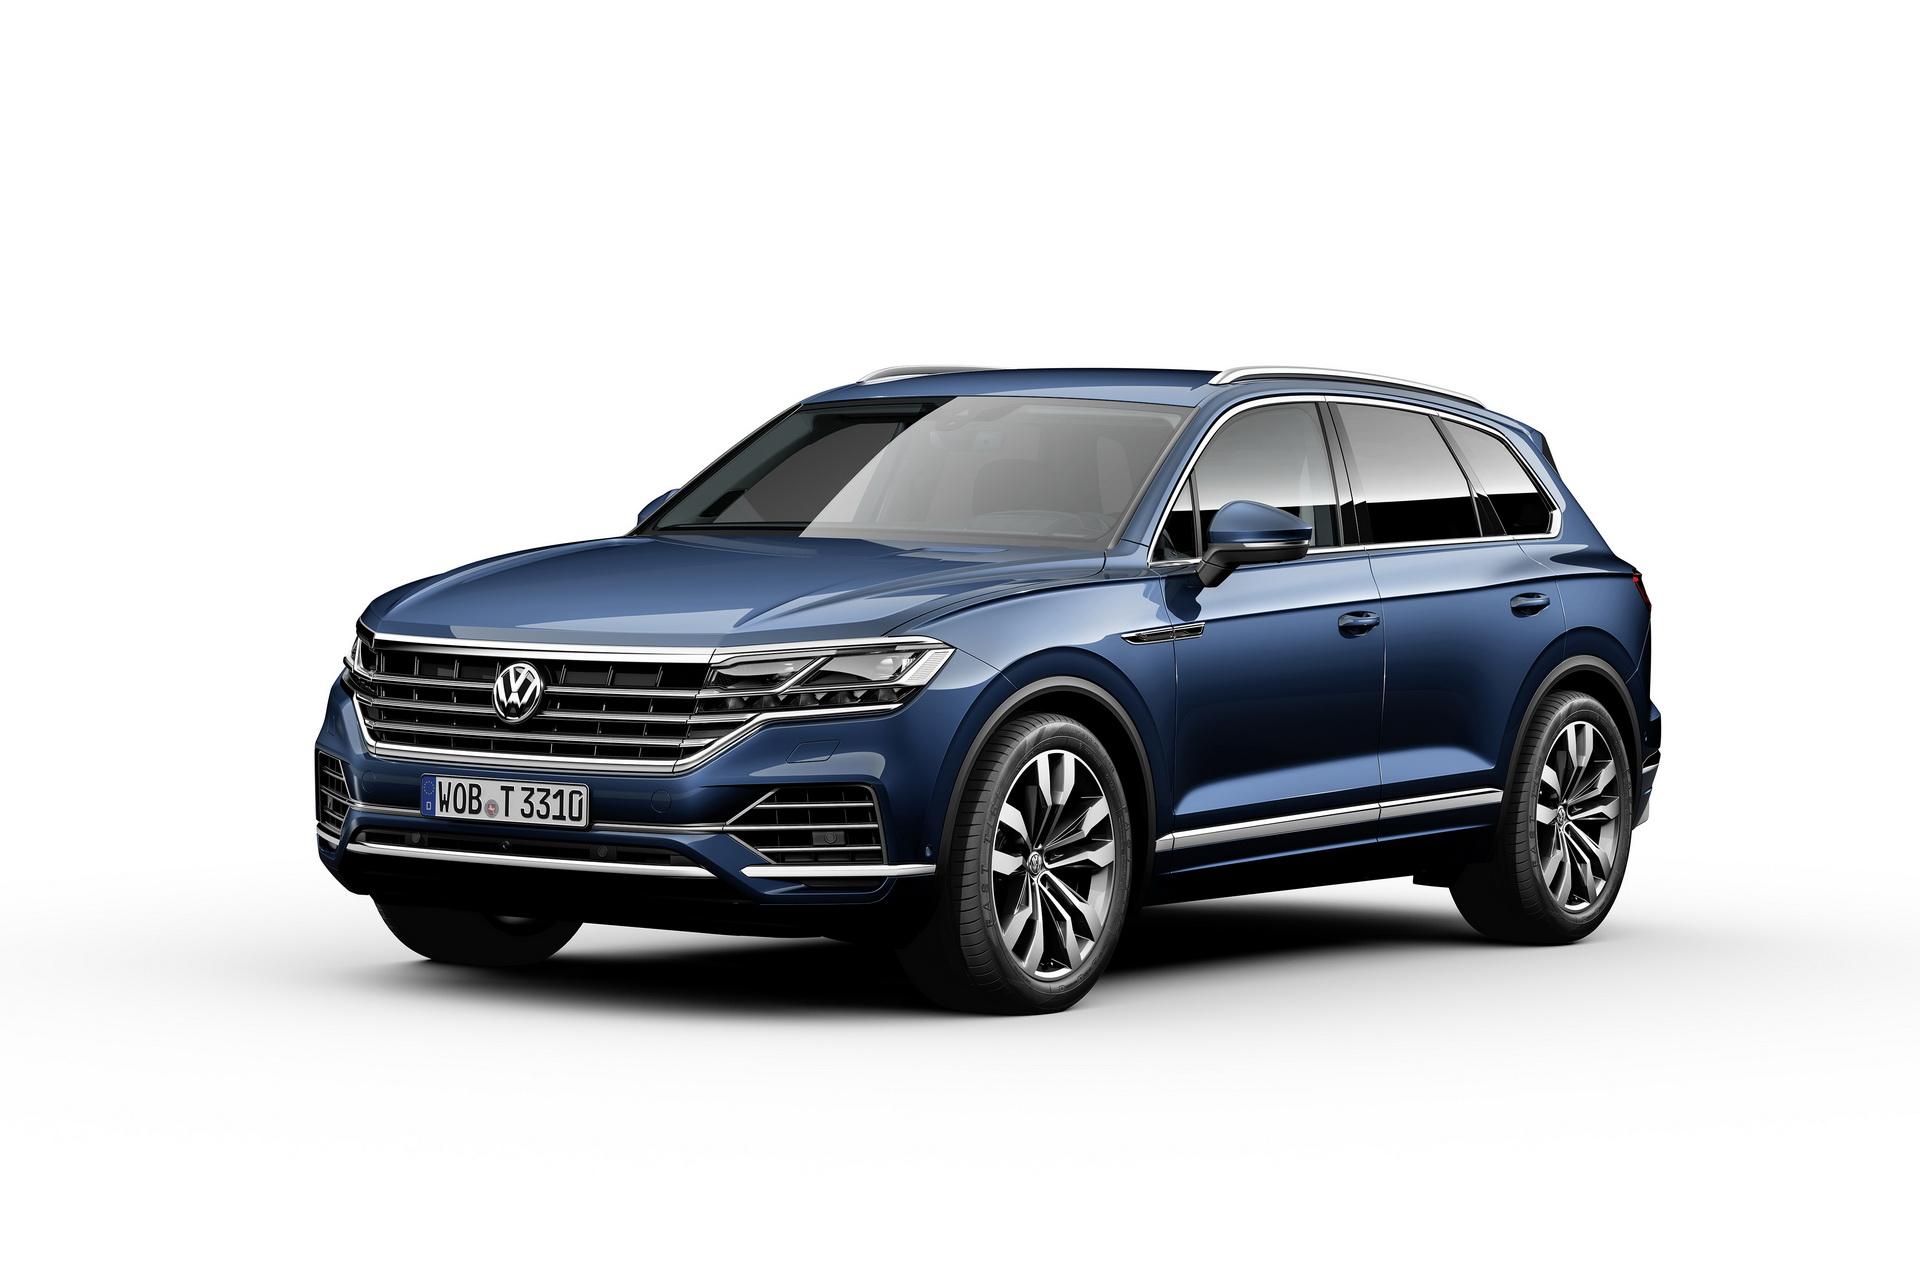 Volkswagen Touareg 2018 (29)